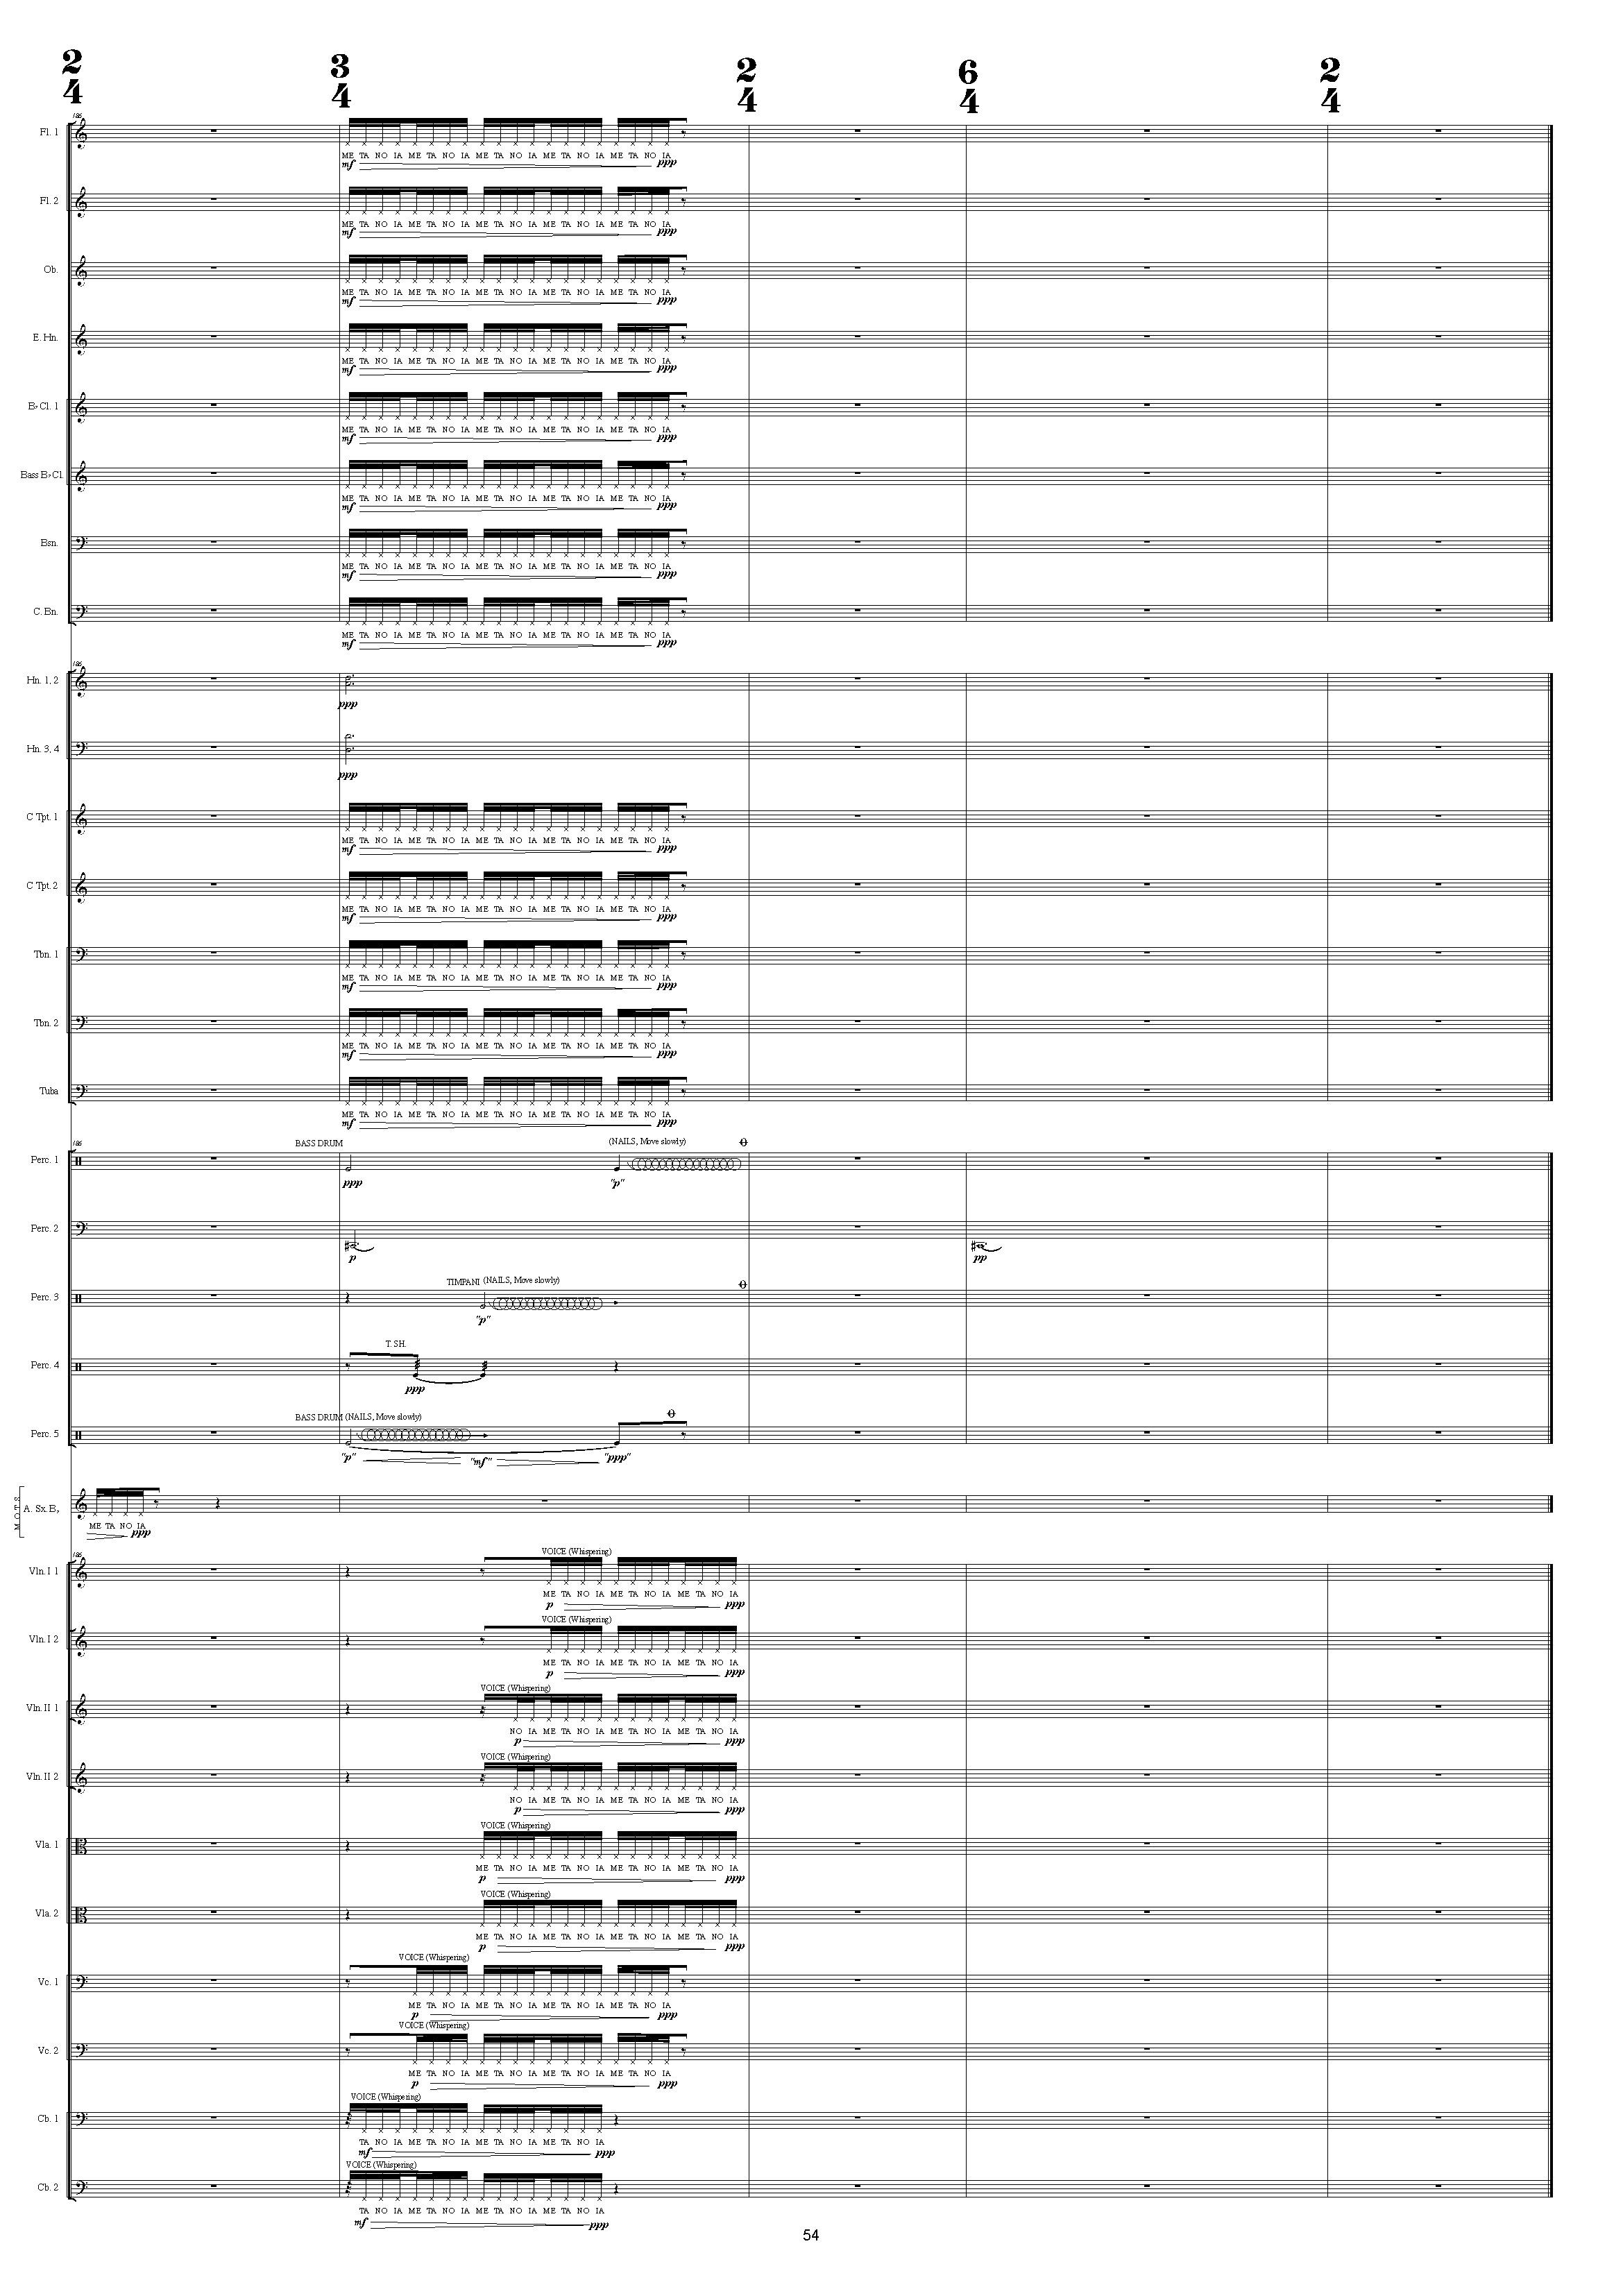 METANOIA_2009-RAPPOPORT_Seite_54.jpg